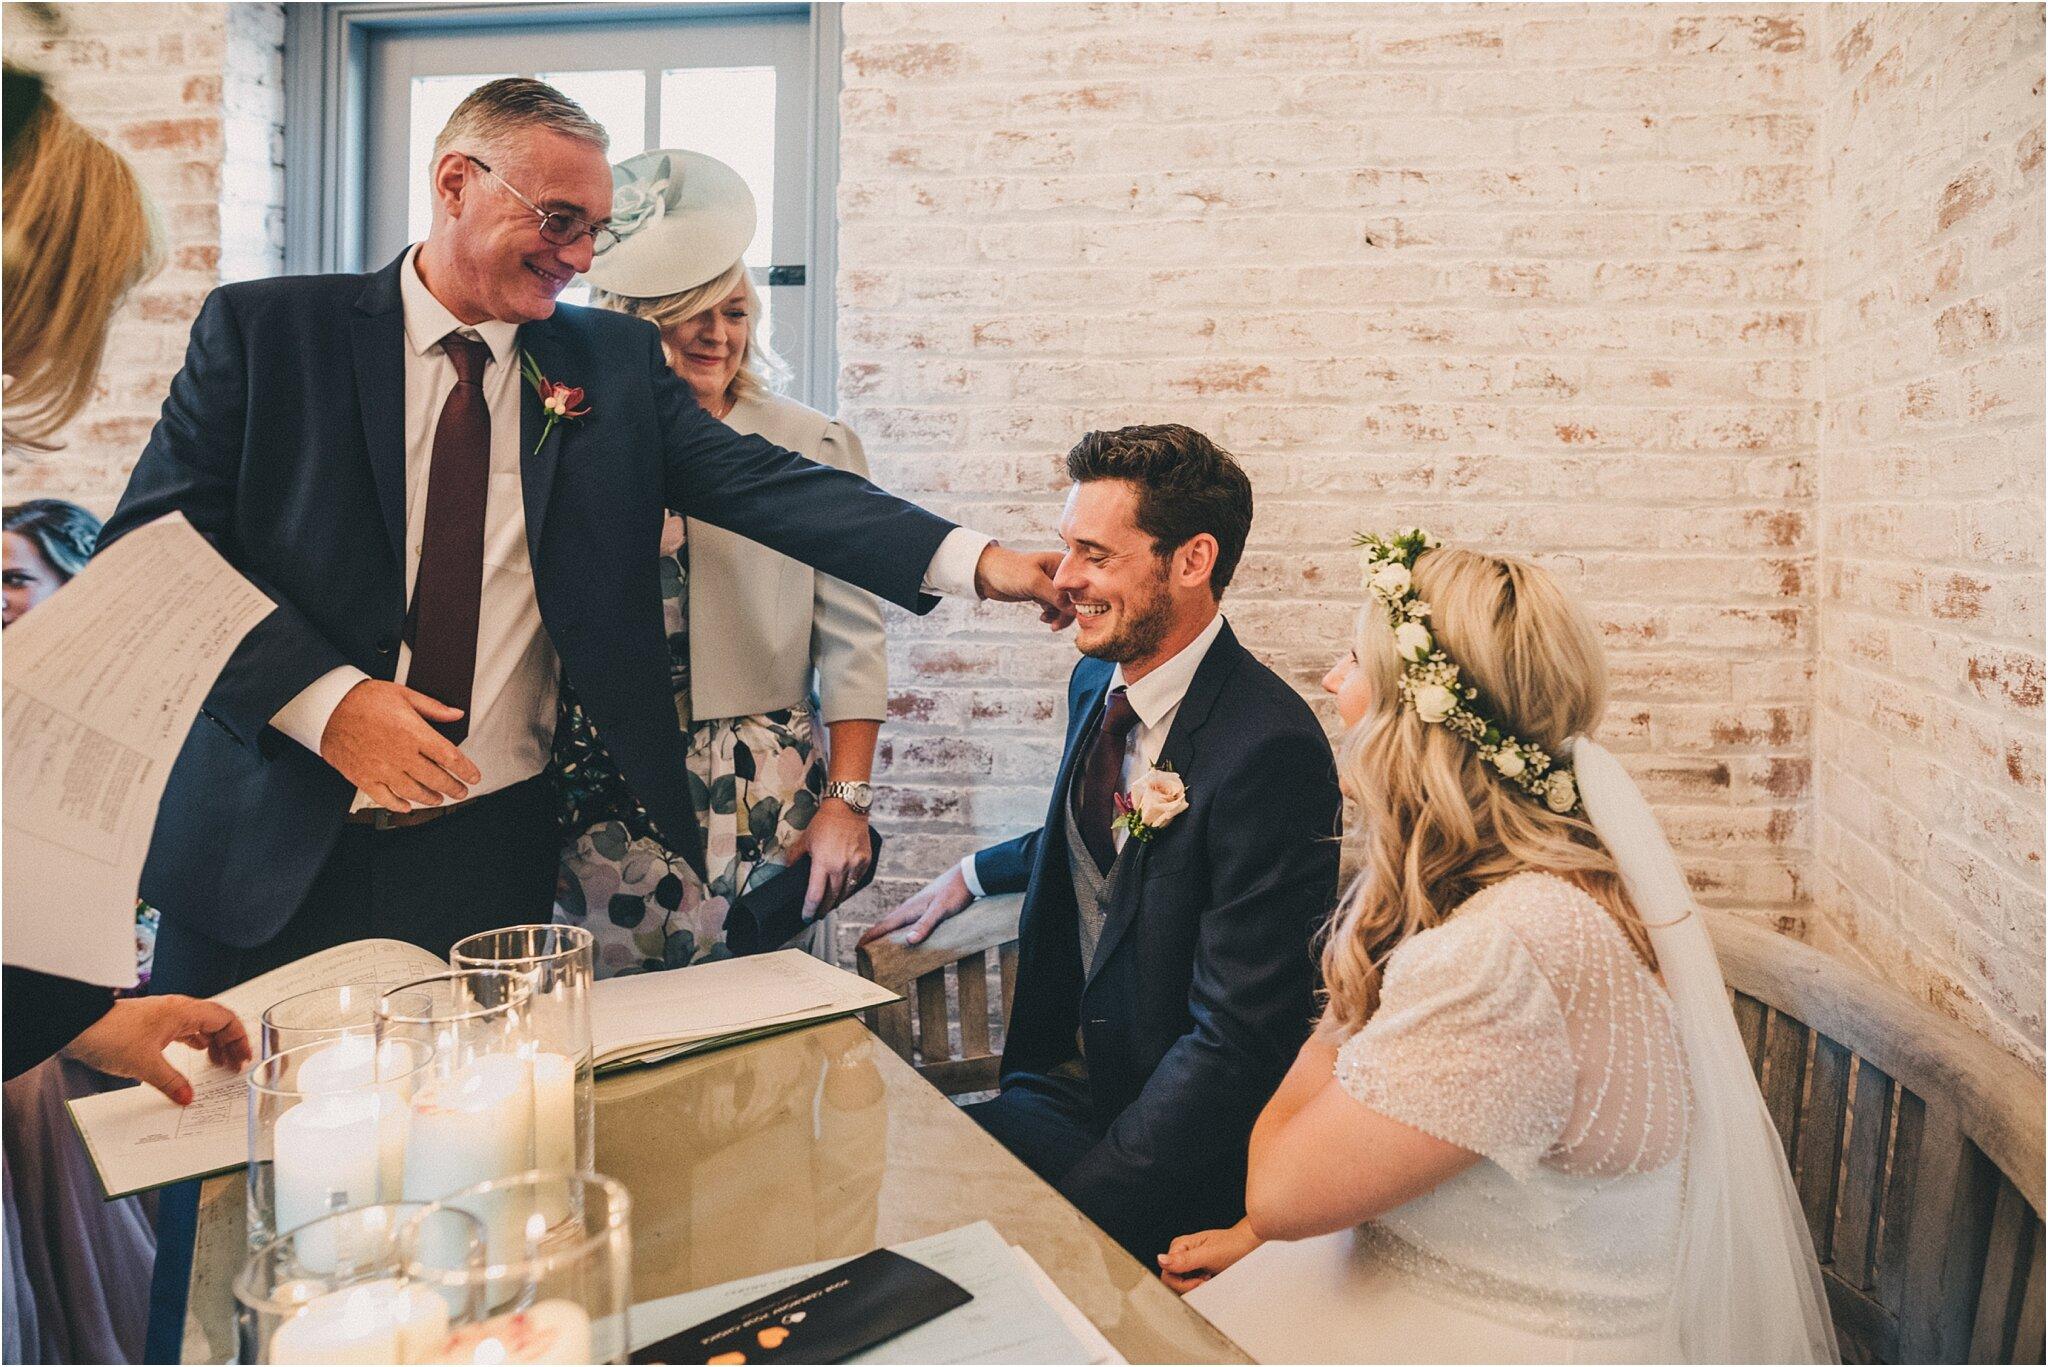 Dorfold Hall marquee wedding 00020.jpg